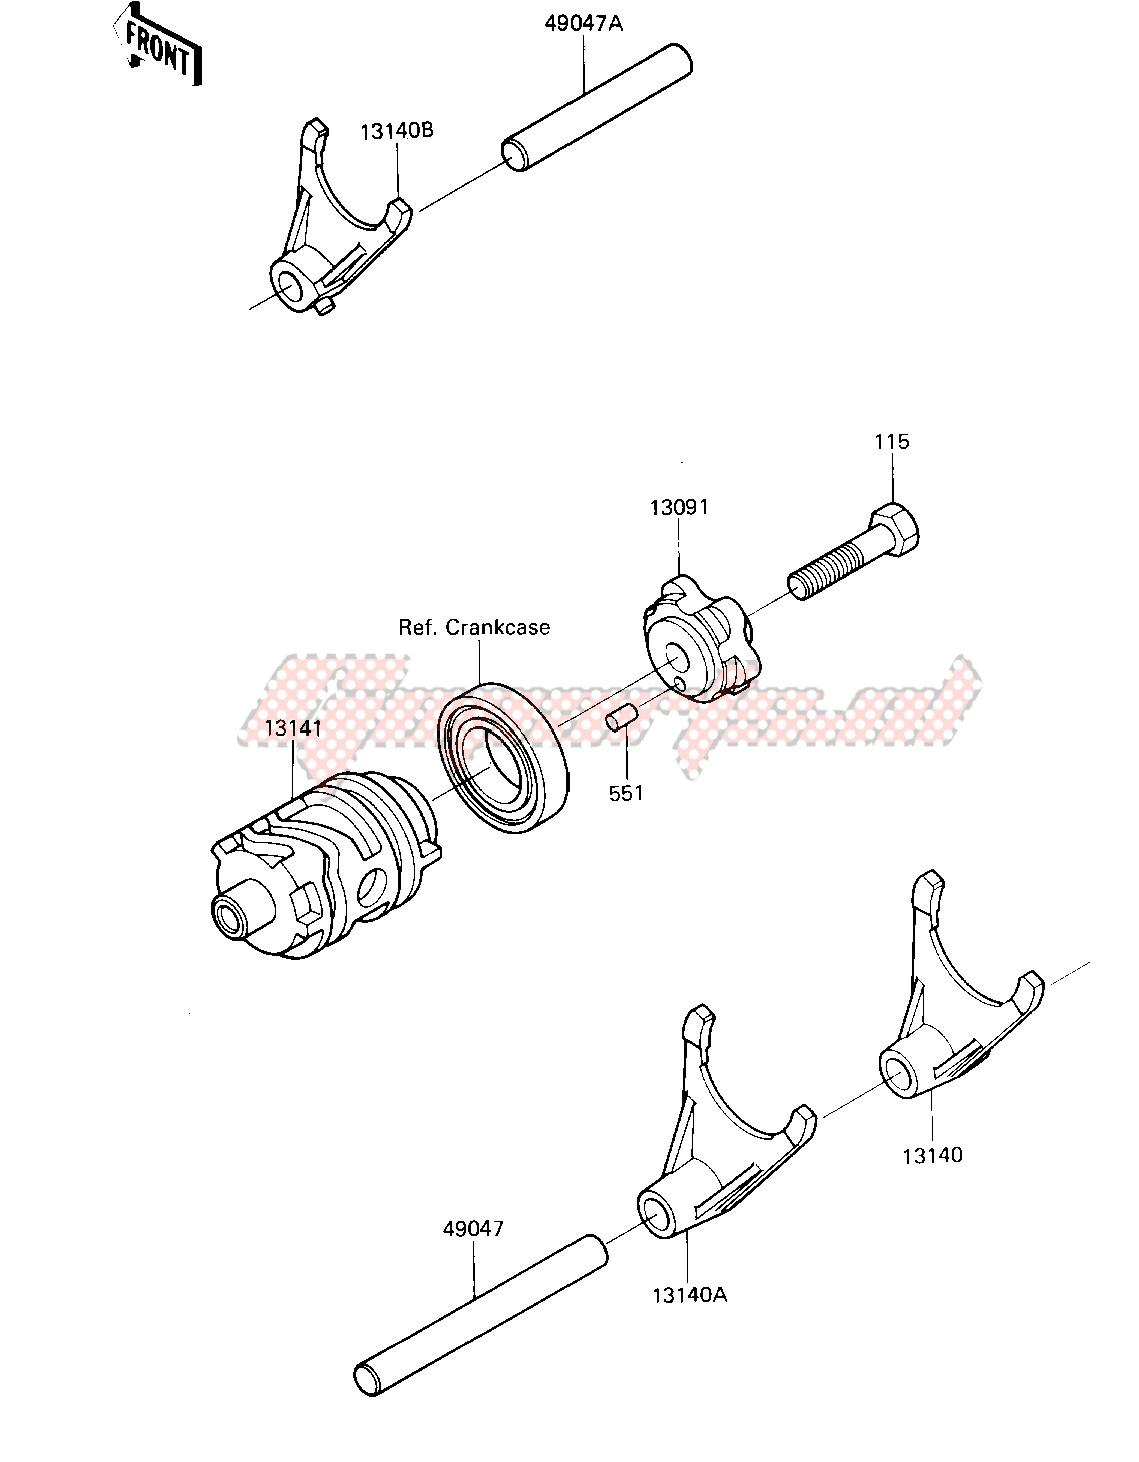 GEAR CHANGE DRUM & FORKS -- 85 A2- - image